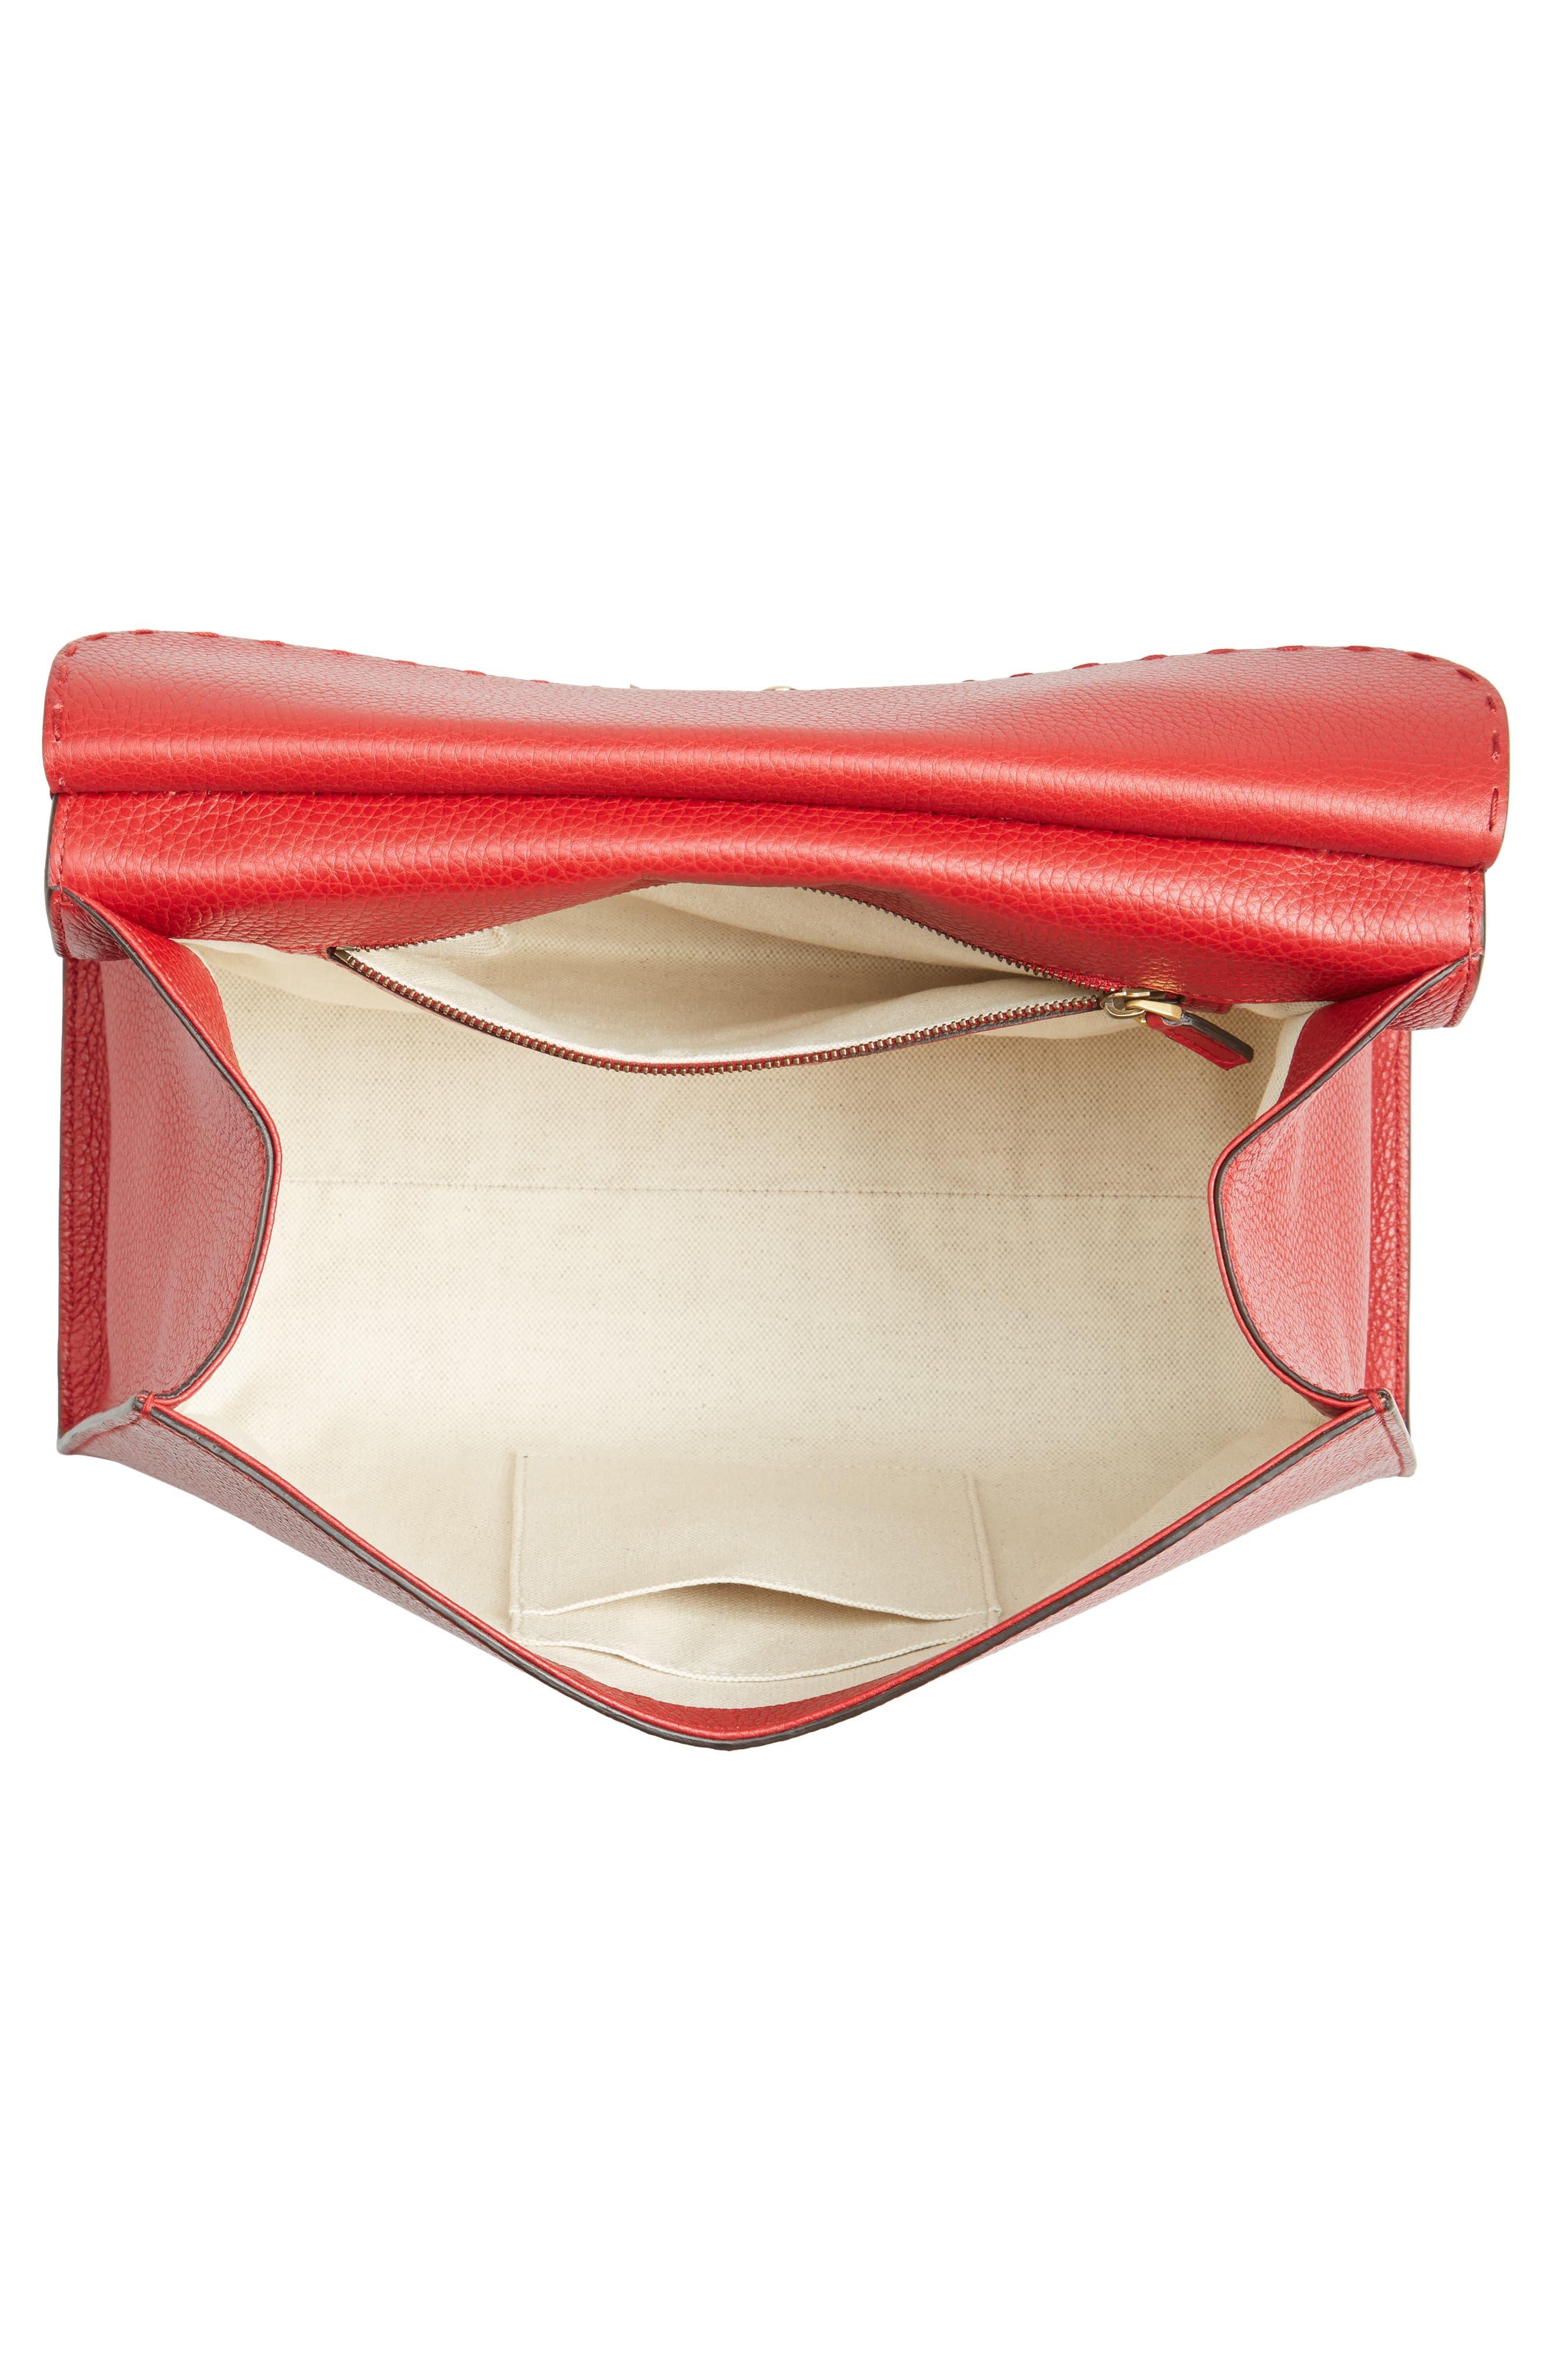 GG Marmont Top Handle Leather Satchel,                             Alternate thumbnail 4, color,                             621